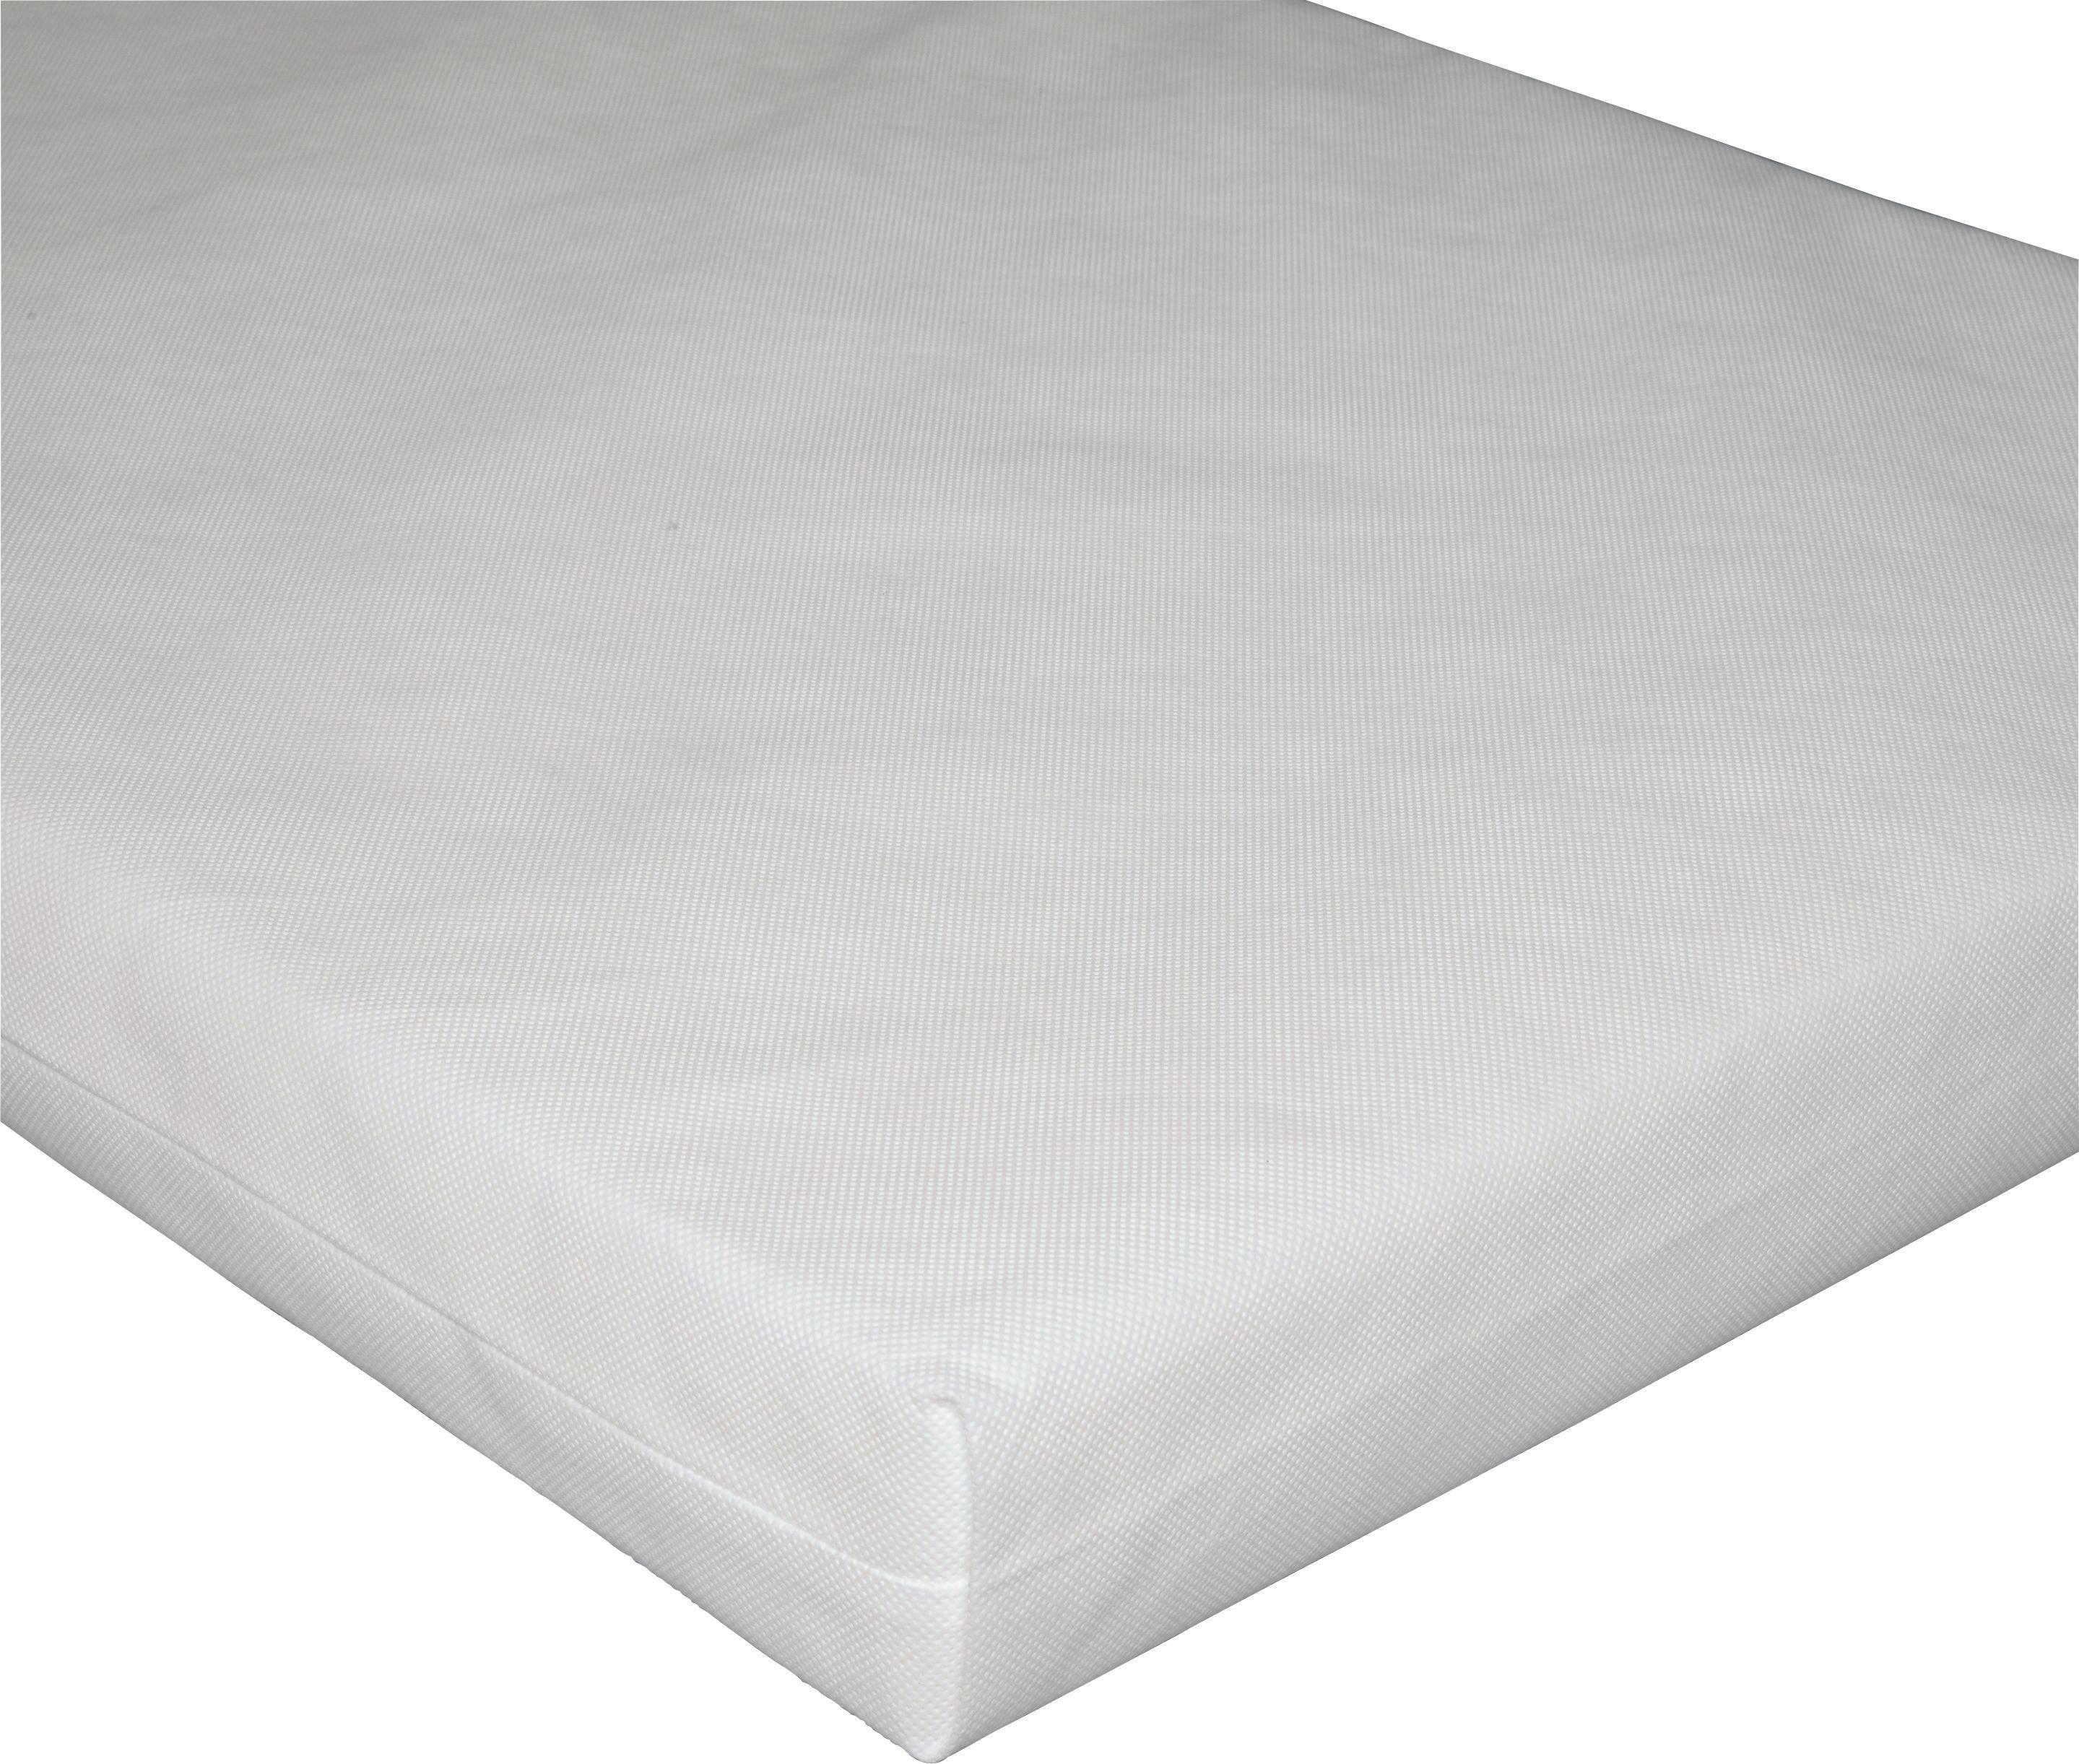 Mamas & Papas - Sleepsafe - Foam - Mattress